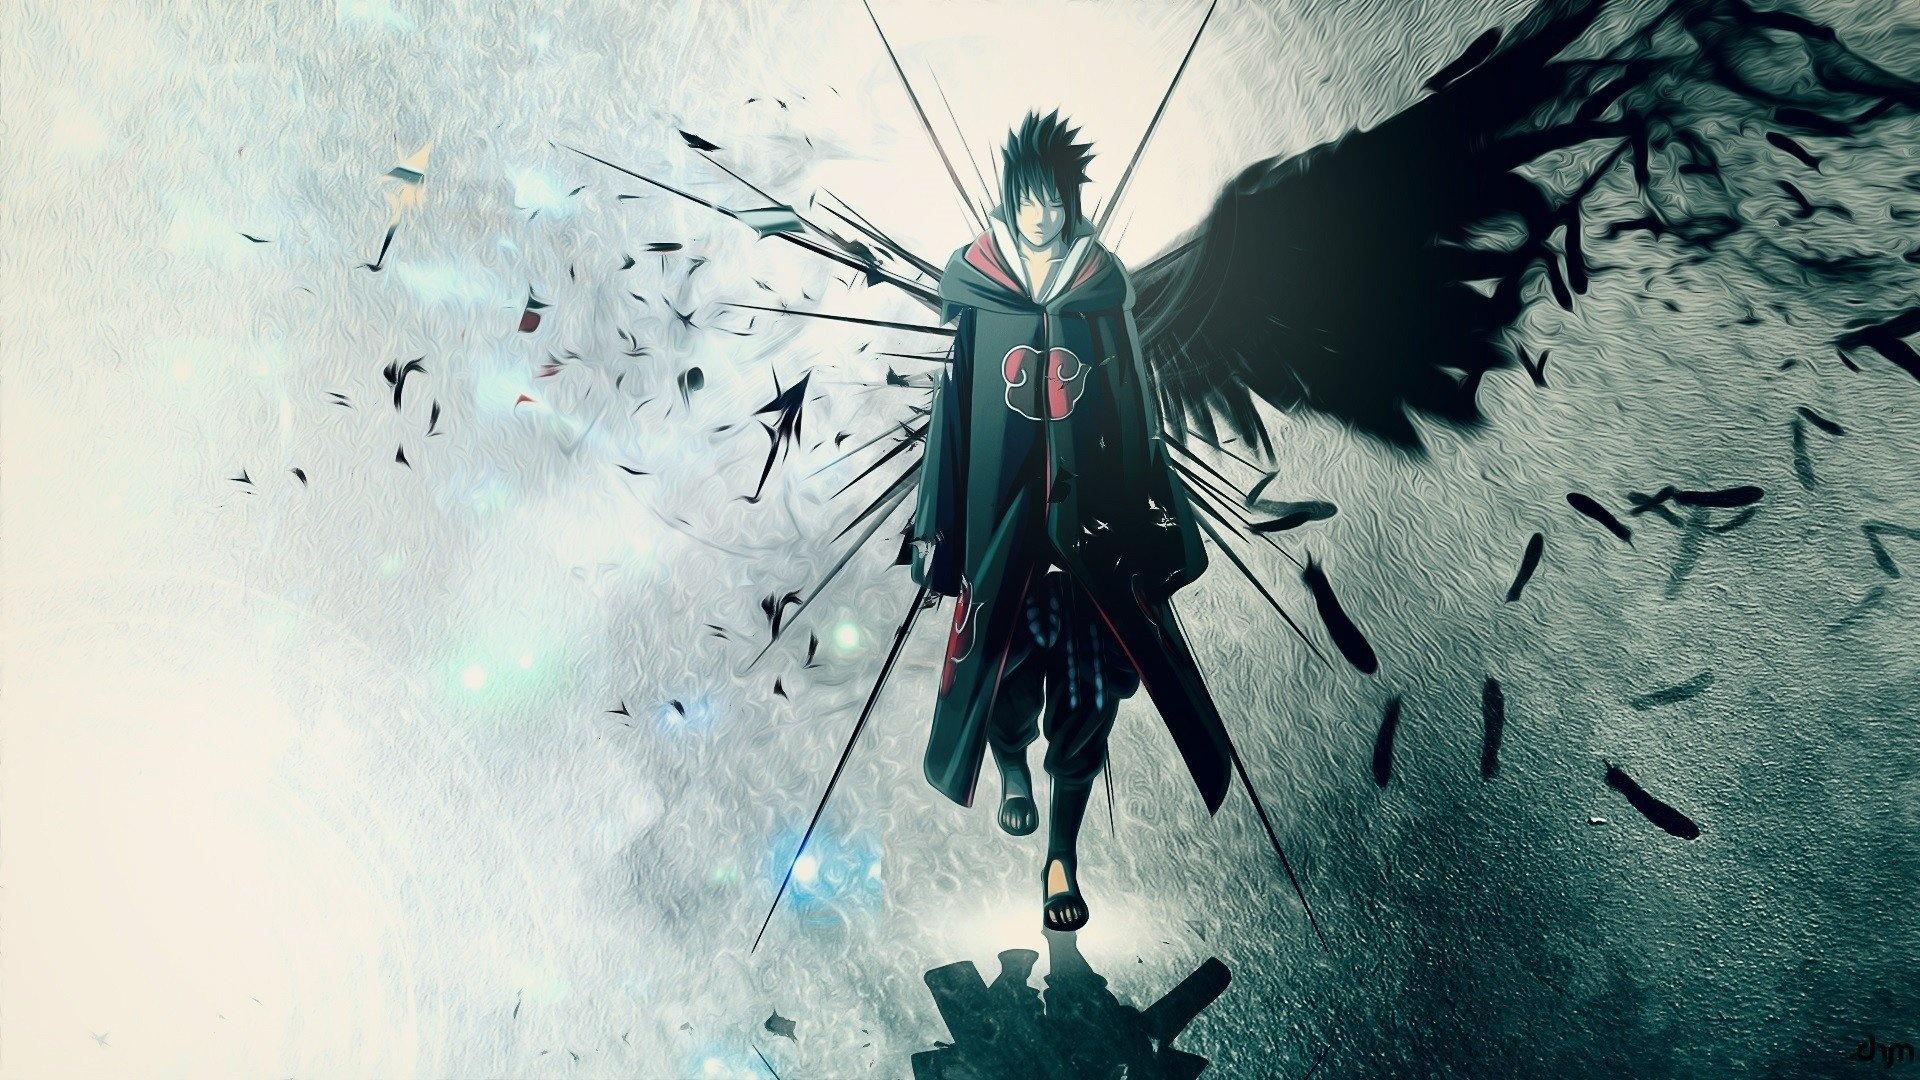 Sasuke 1920x1080 wallpaper